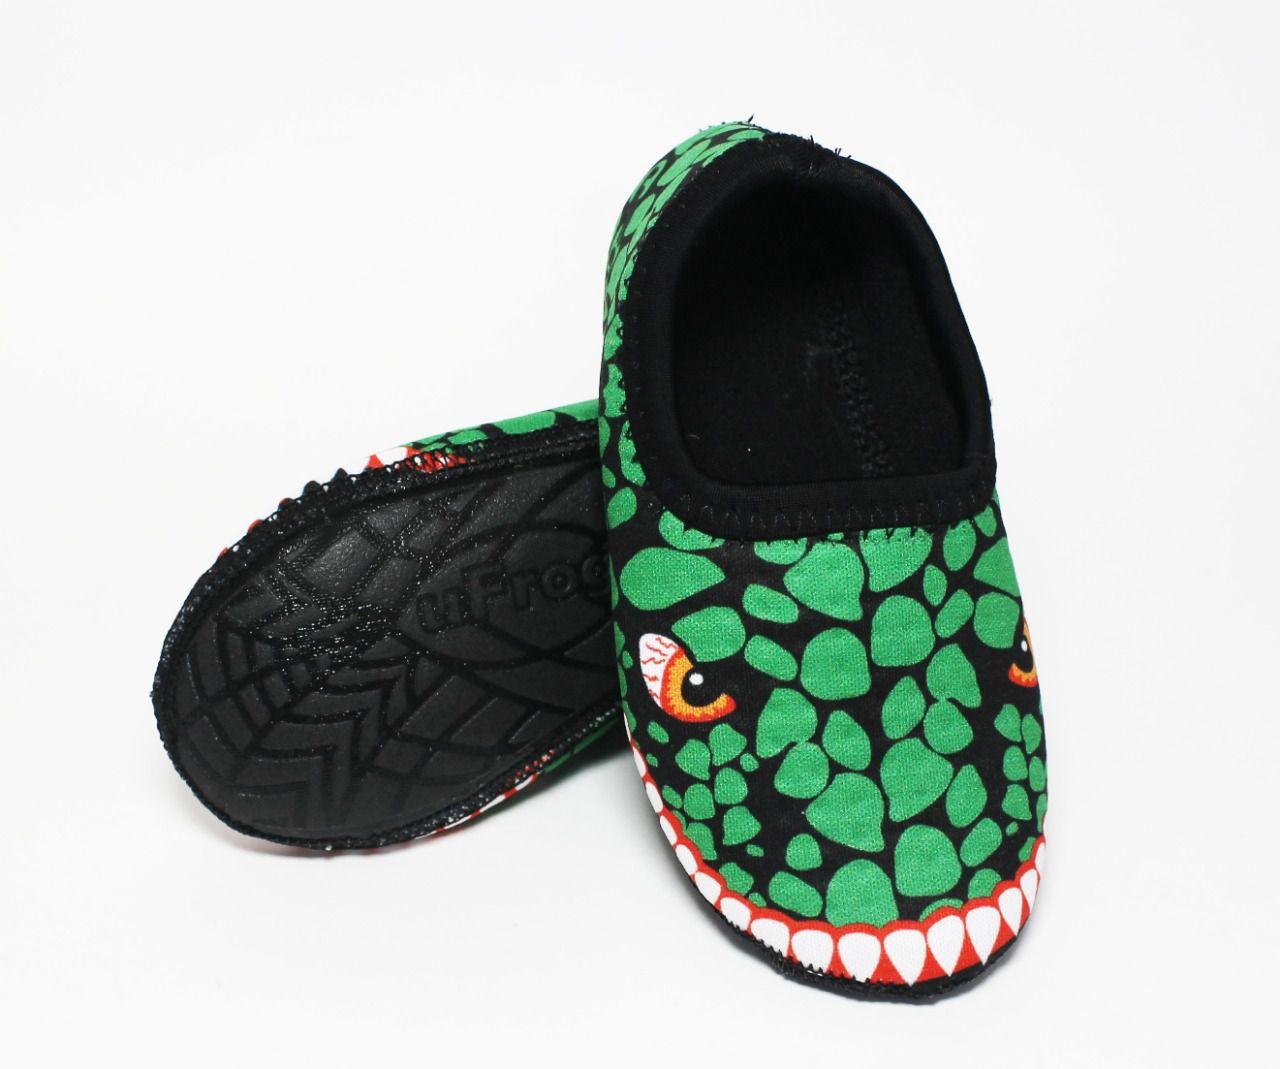 Sapato de Neoprene Fit T-Rex Ufrog